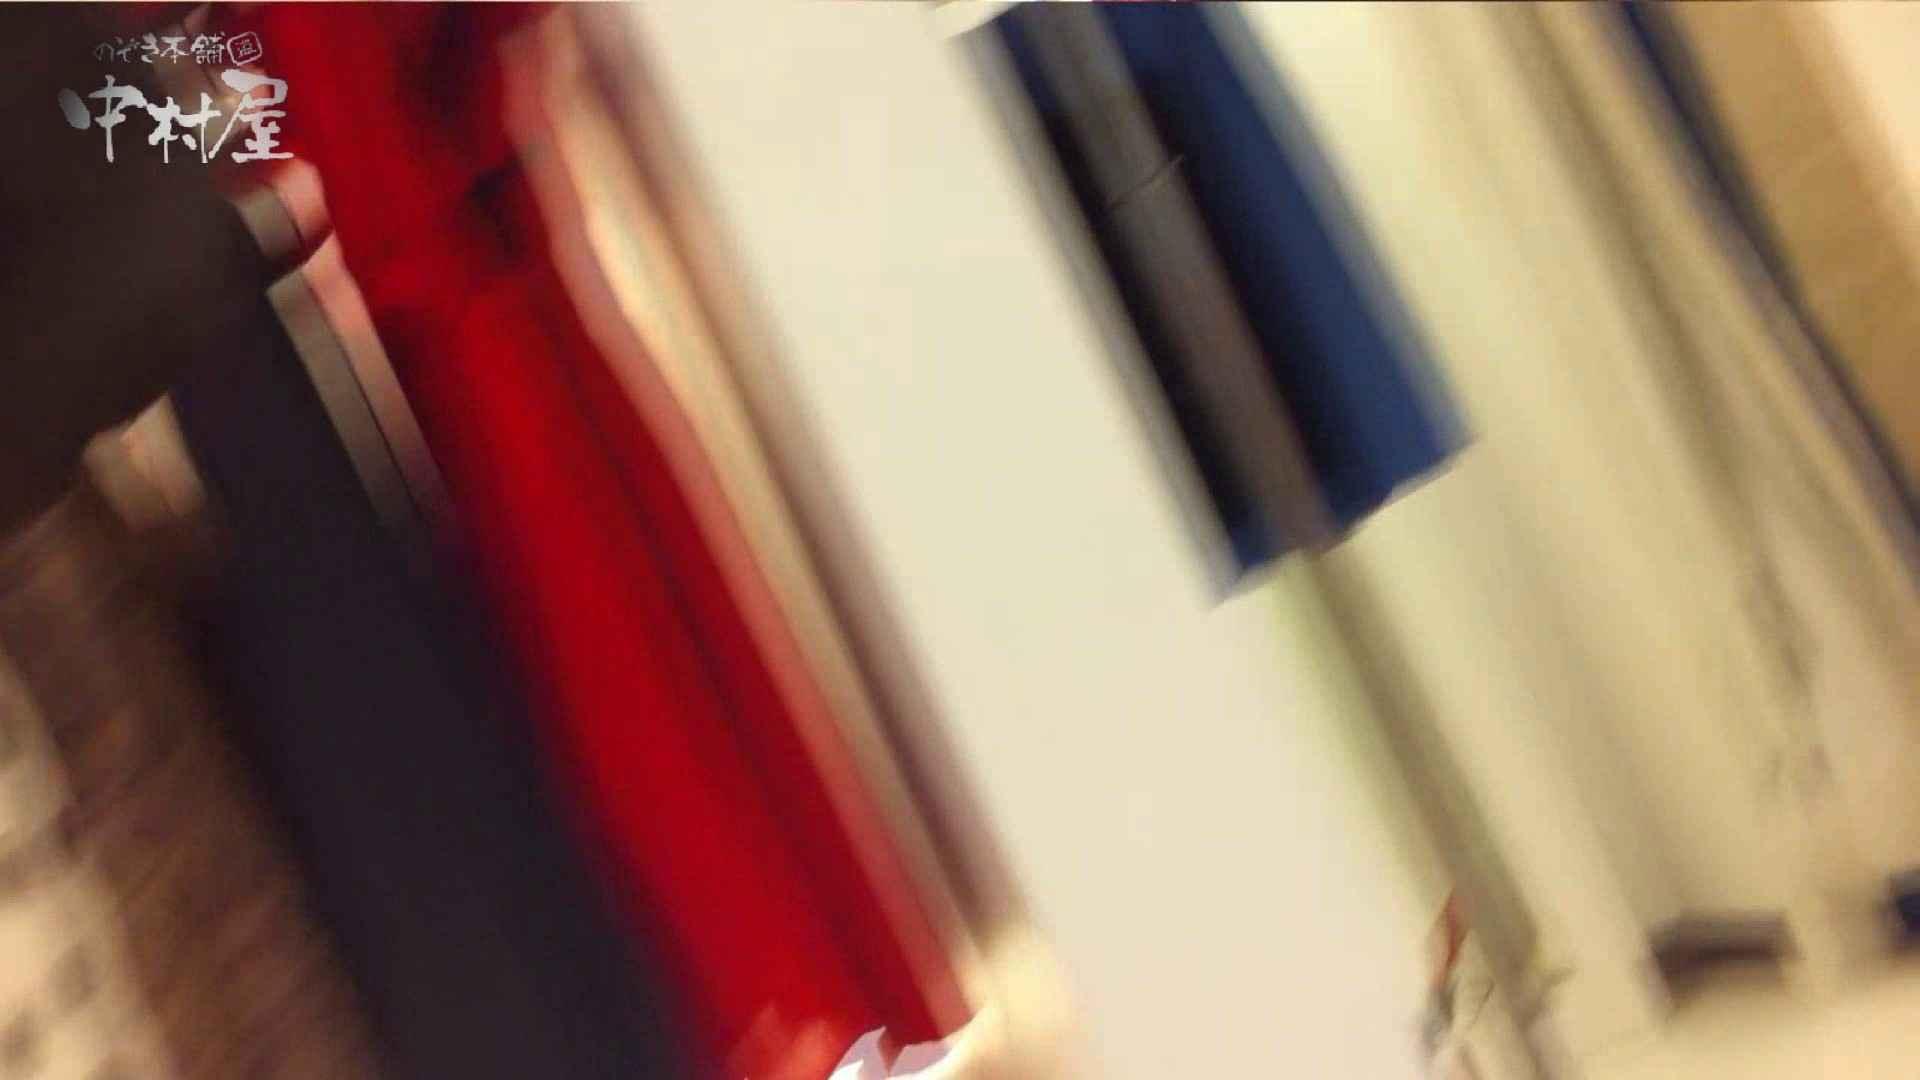 vol.81 美人アパレル胸チラ&パンチラ 食い込みショッピング 新入生パンチラ オメコ無修正動画無料 78pic 53